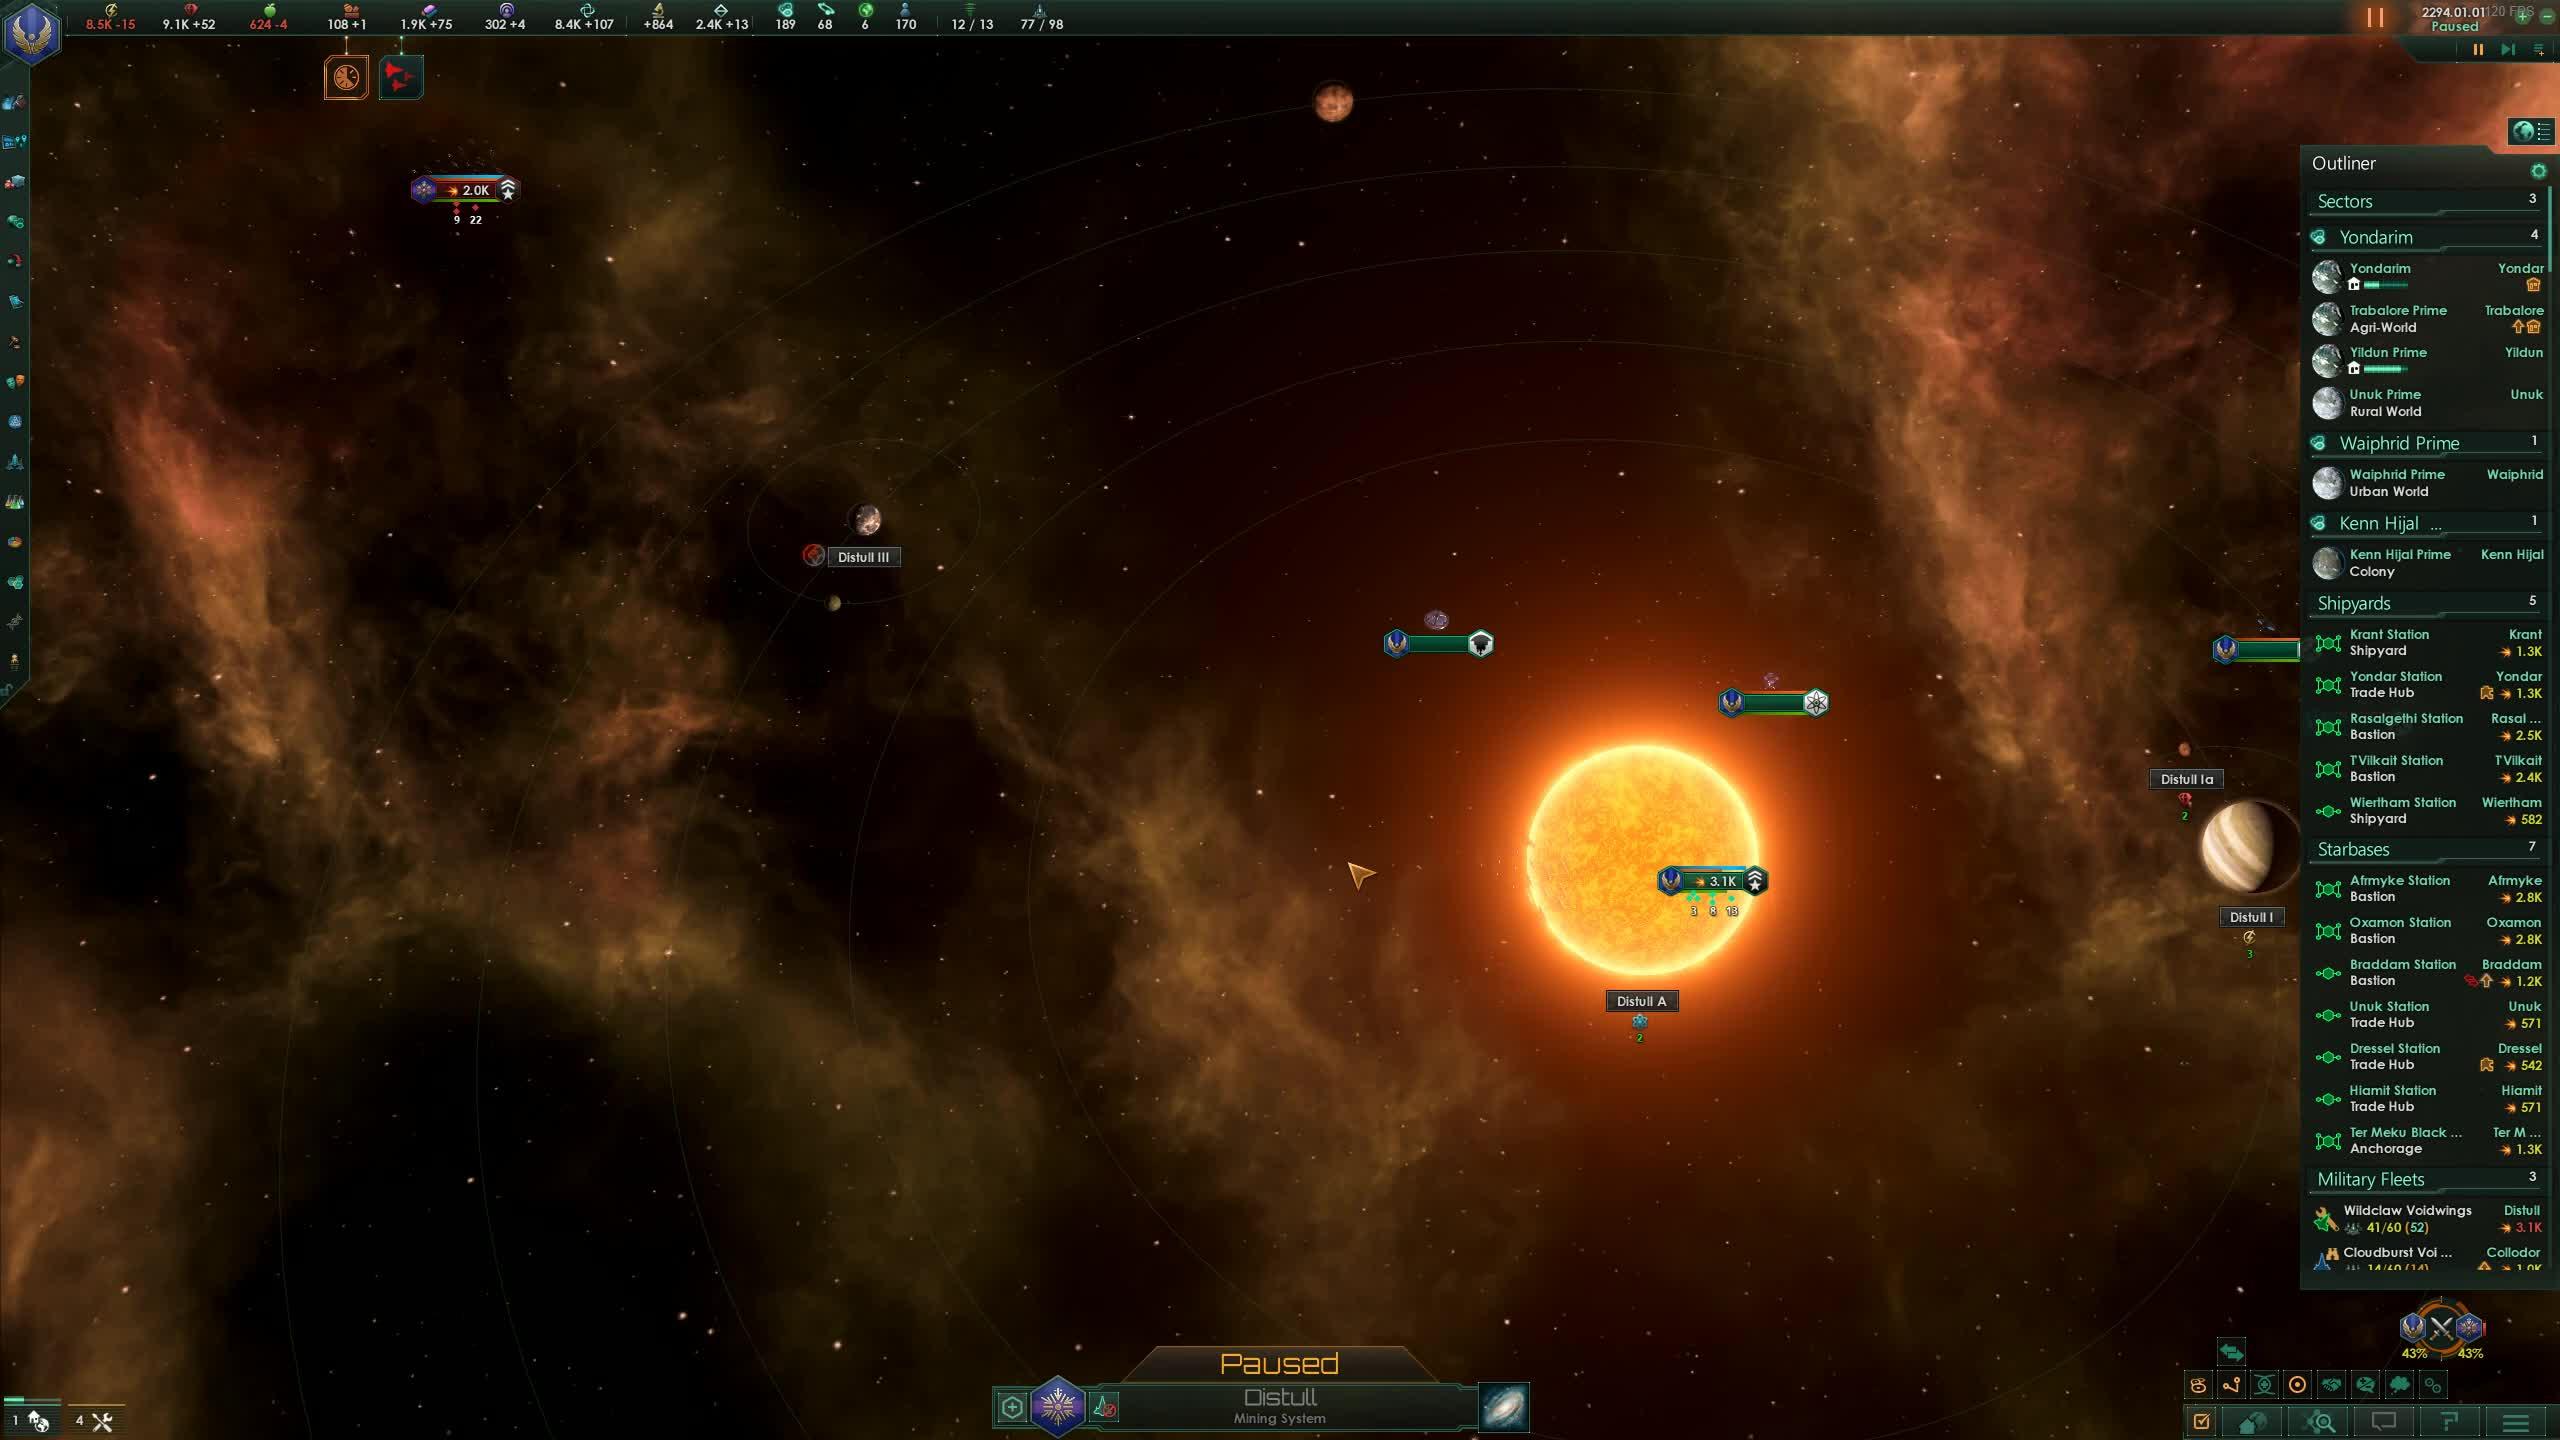 stellaris, Stellaris 2019.03.24 - 20.59.22.01 GIFs